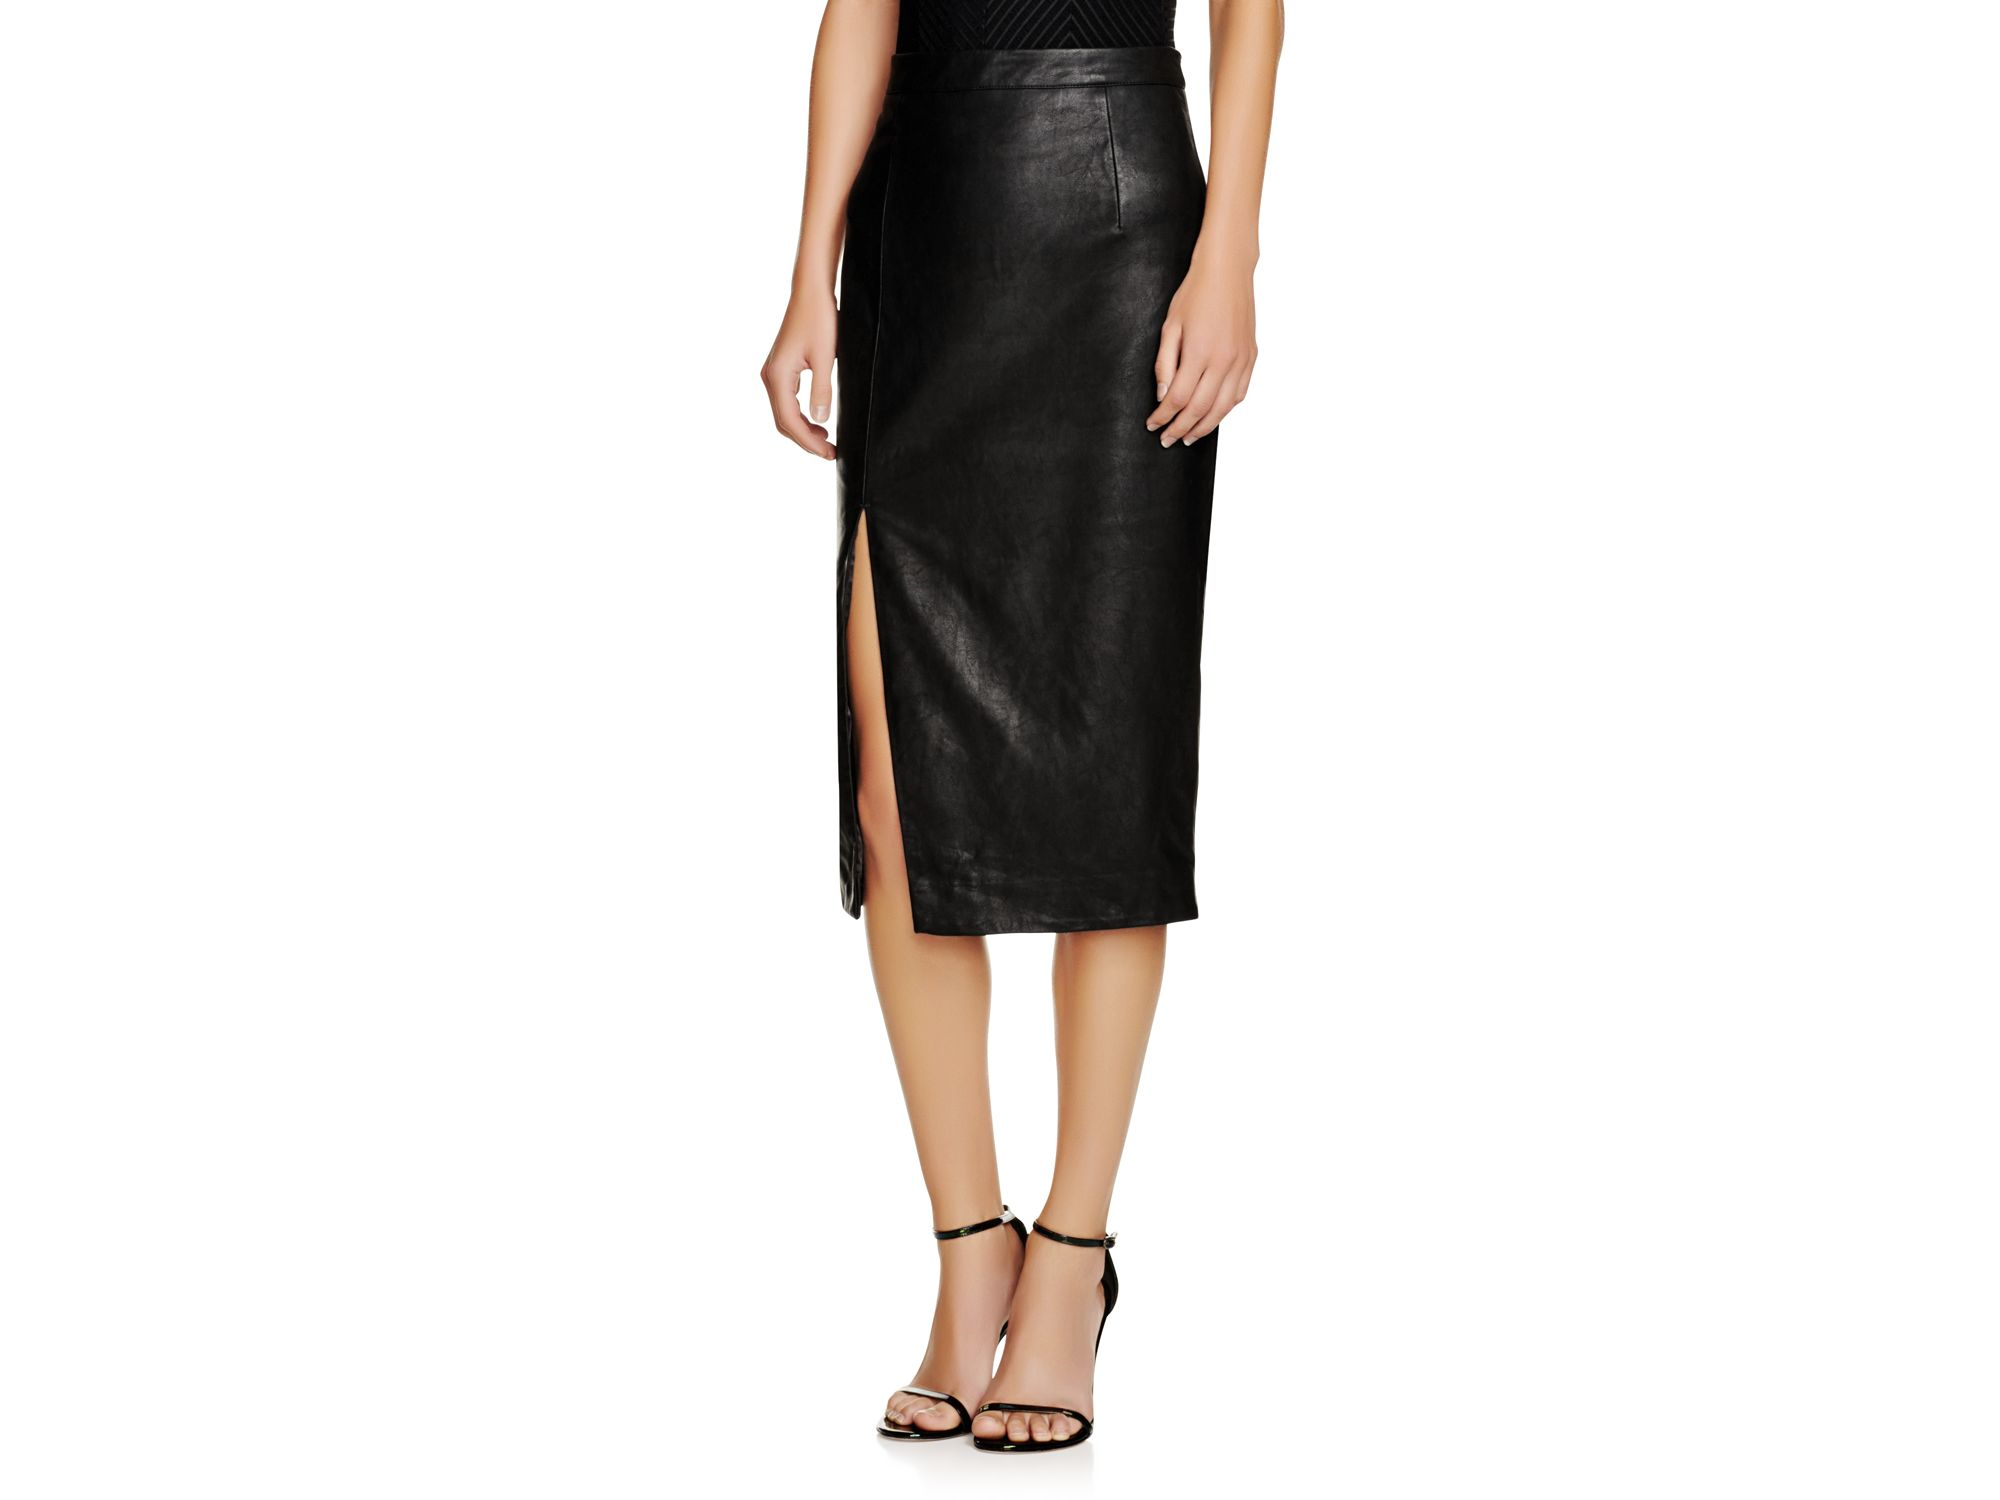 Bardot Faux Leather Side Slit Pencil Skirt in Black | Lyst